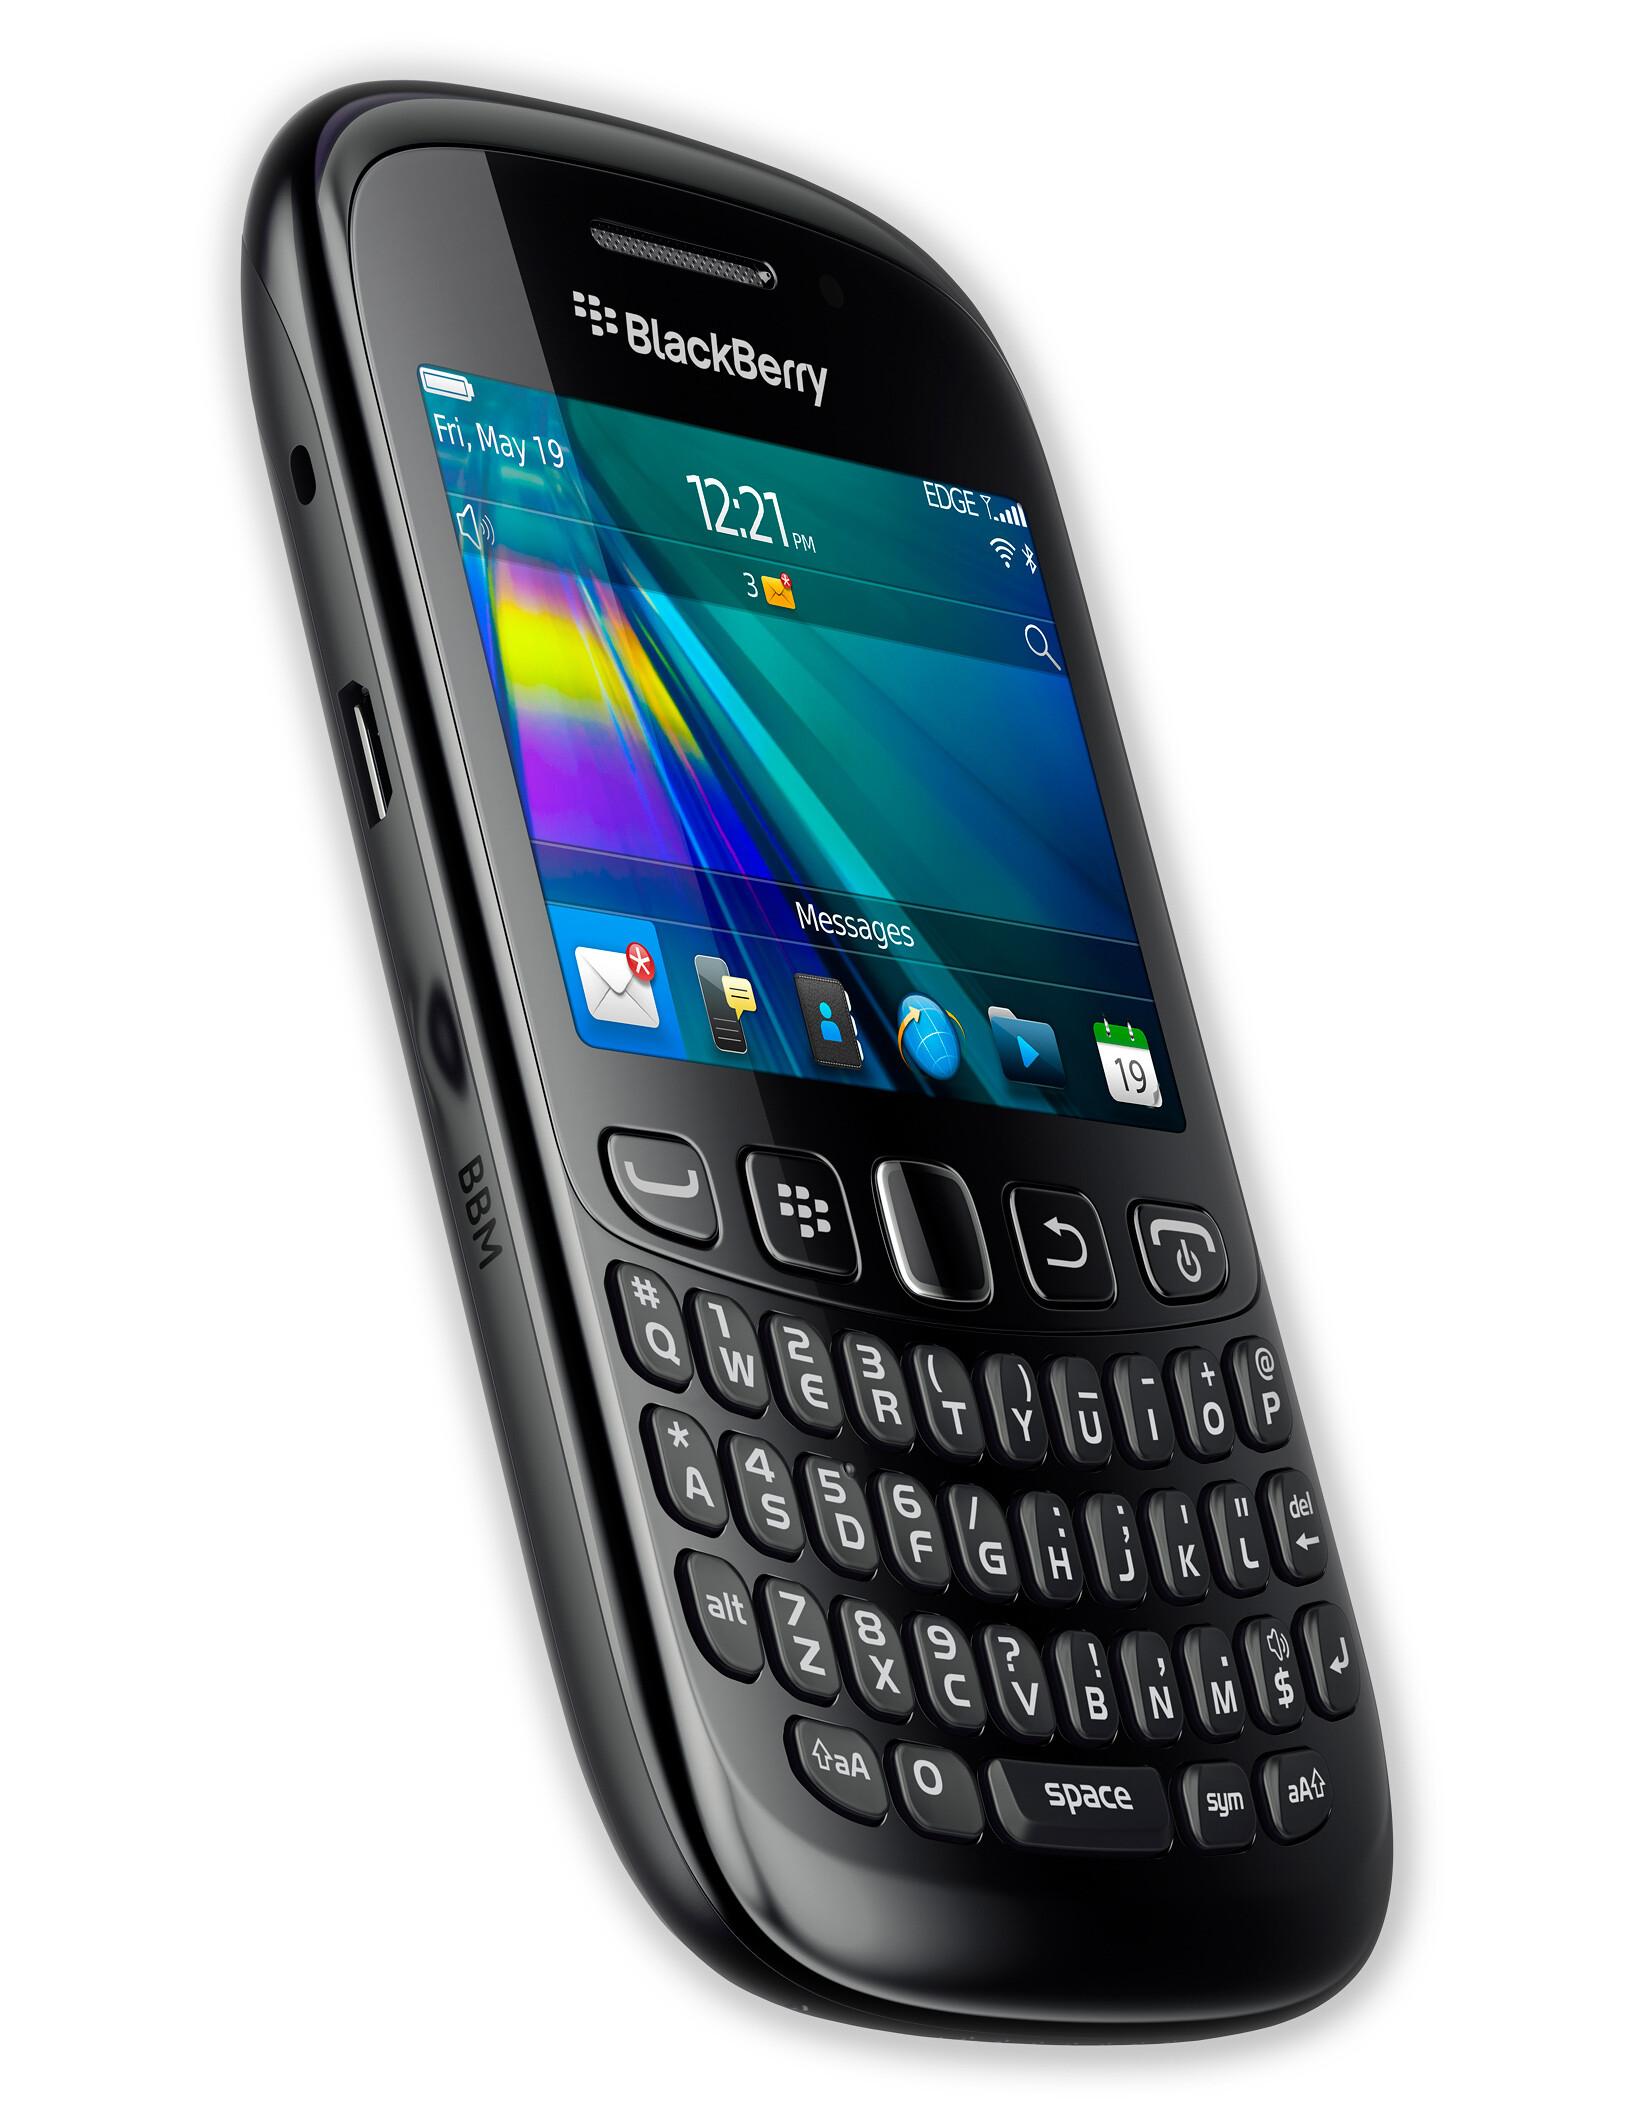 Blackberry Curve 9320 Black And Silver BlackBerry Curve 9320 ...